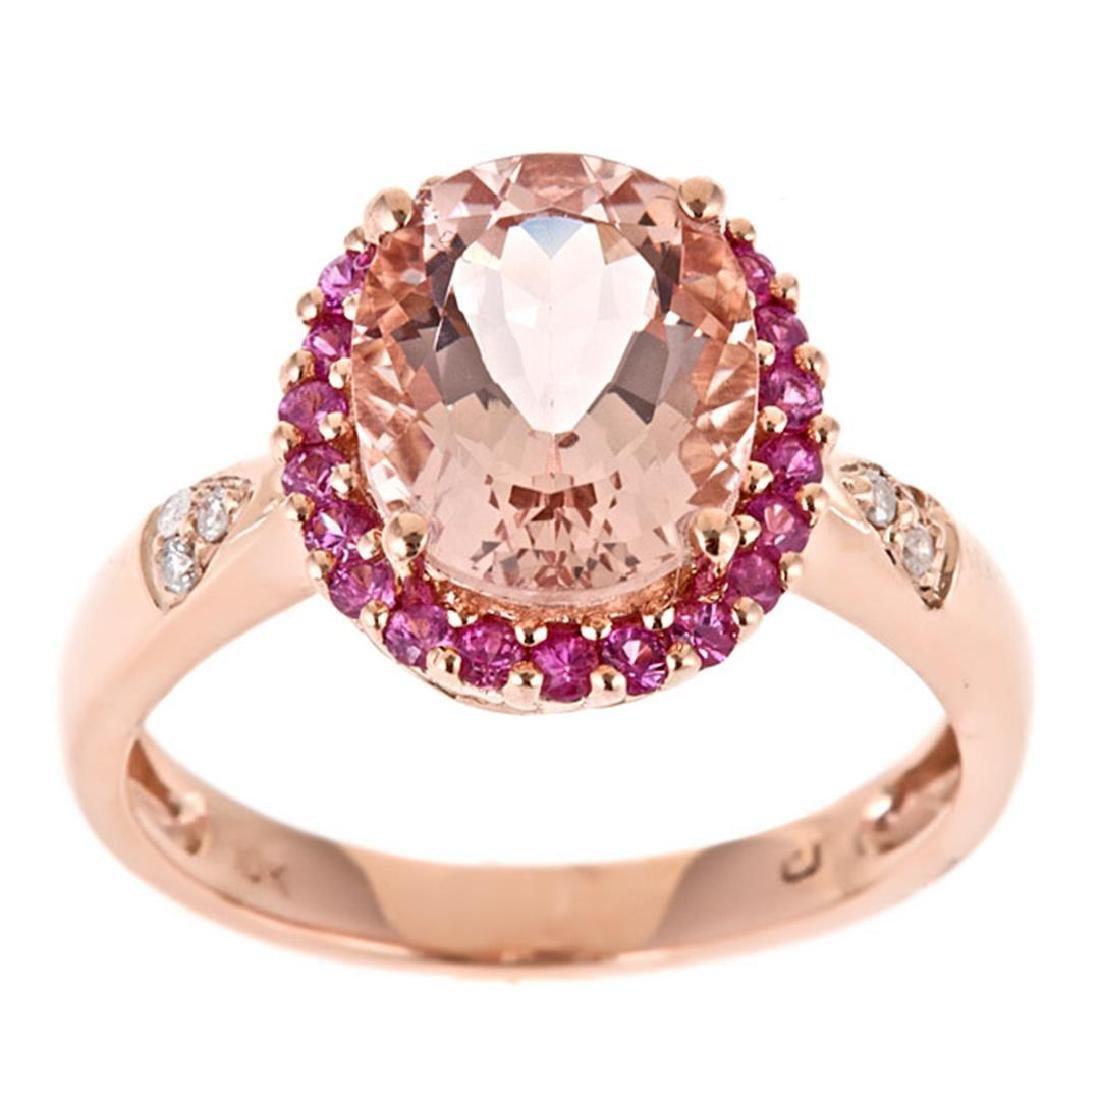 2.35 ctw Morganite, Pink Sapphire and Diamond Ring -